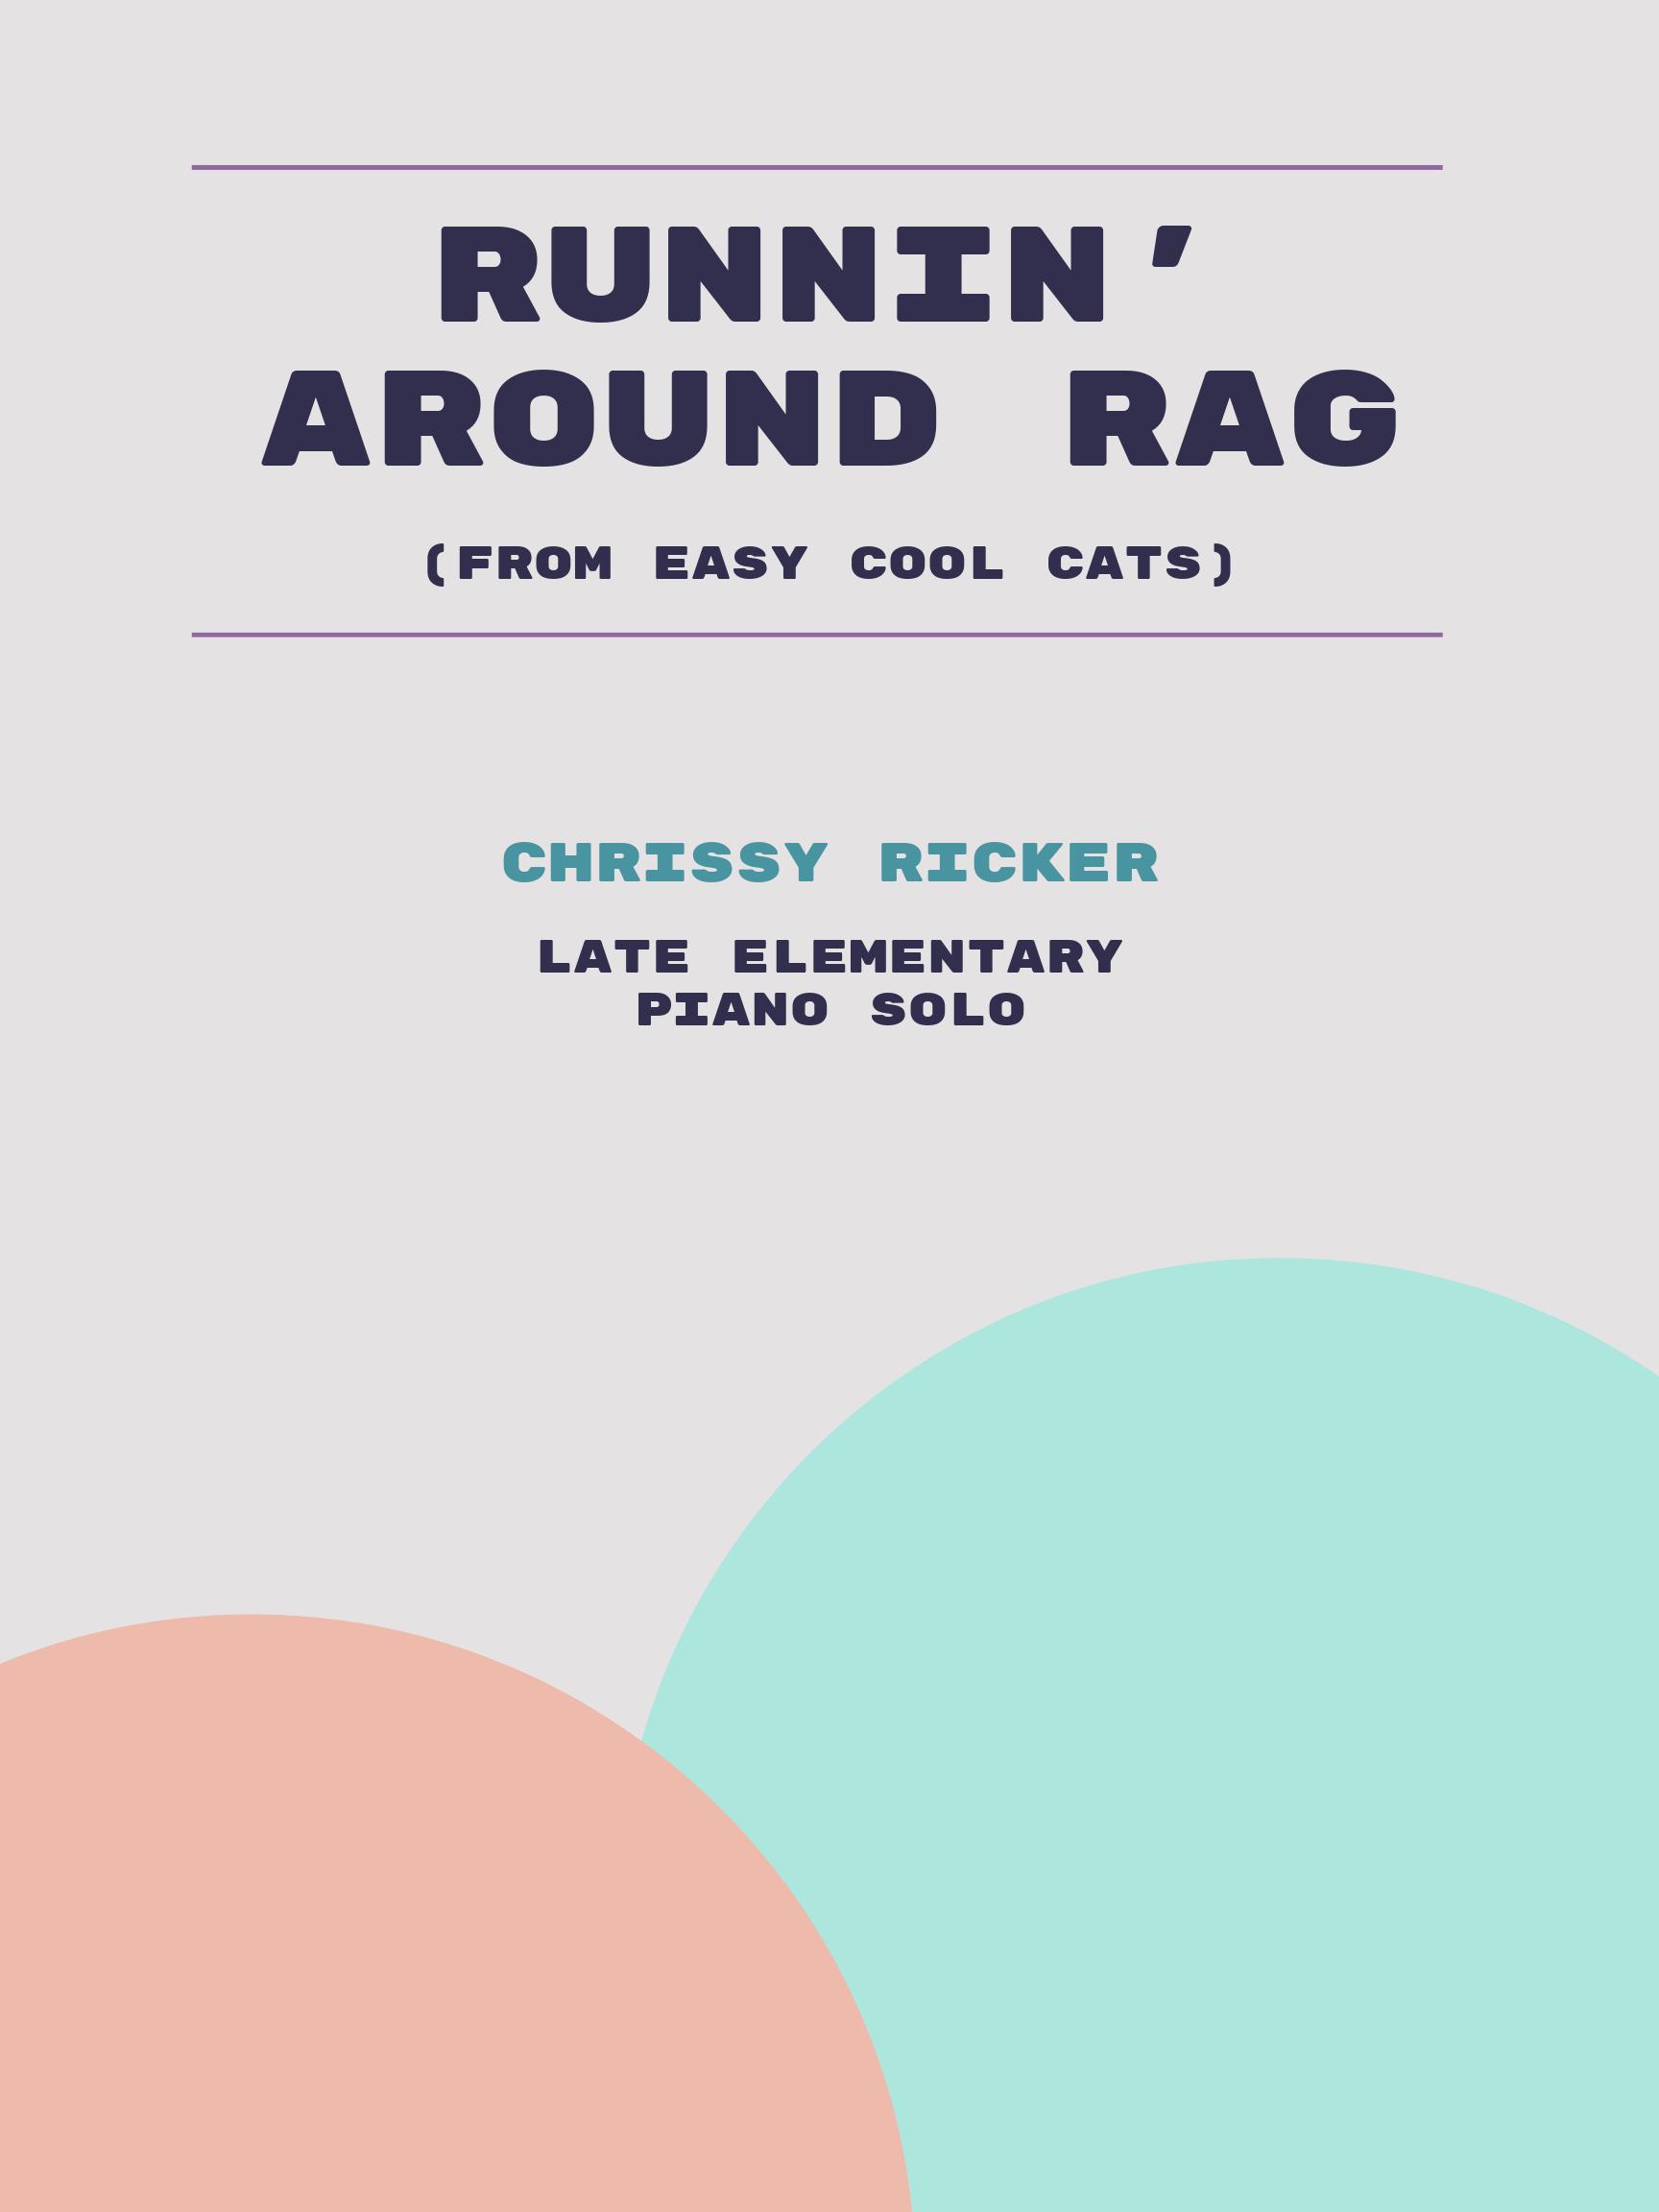 Runnin' Around Rag by Chrissy Ricker